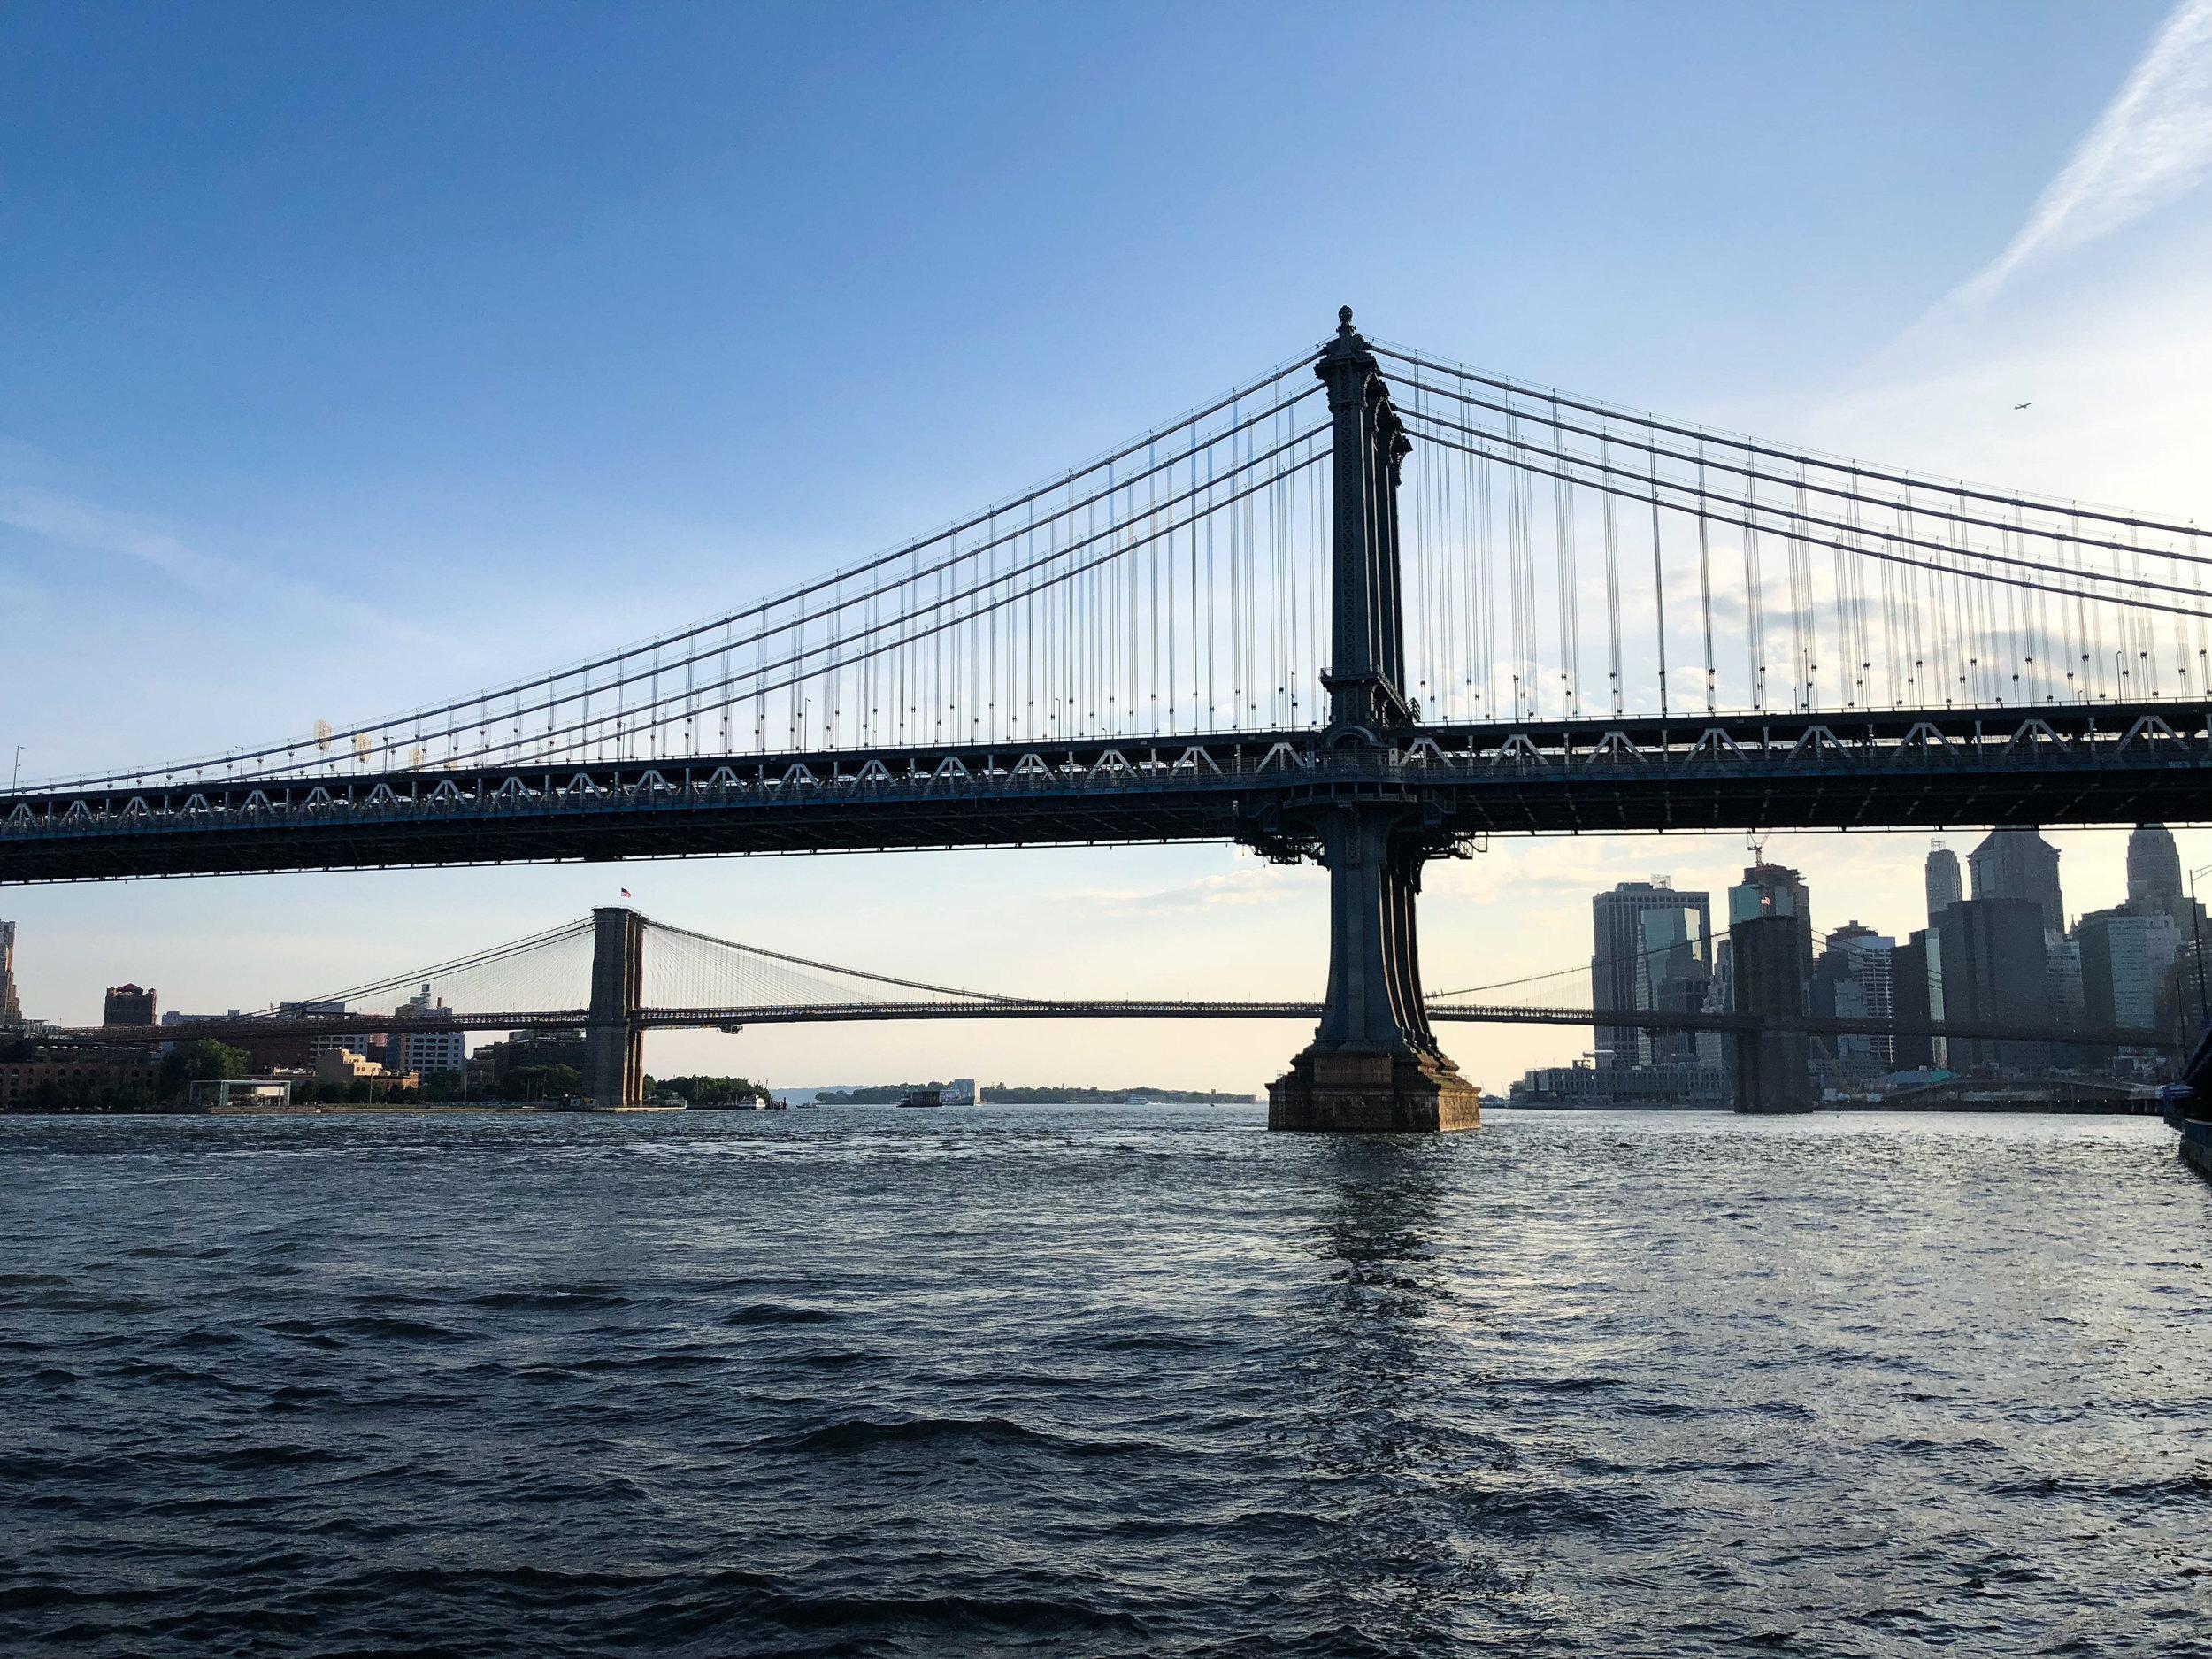 Manhattan and Brooklyn Bridges. Eastside Greenway, Midtown East, New York City 2018